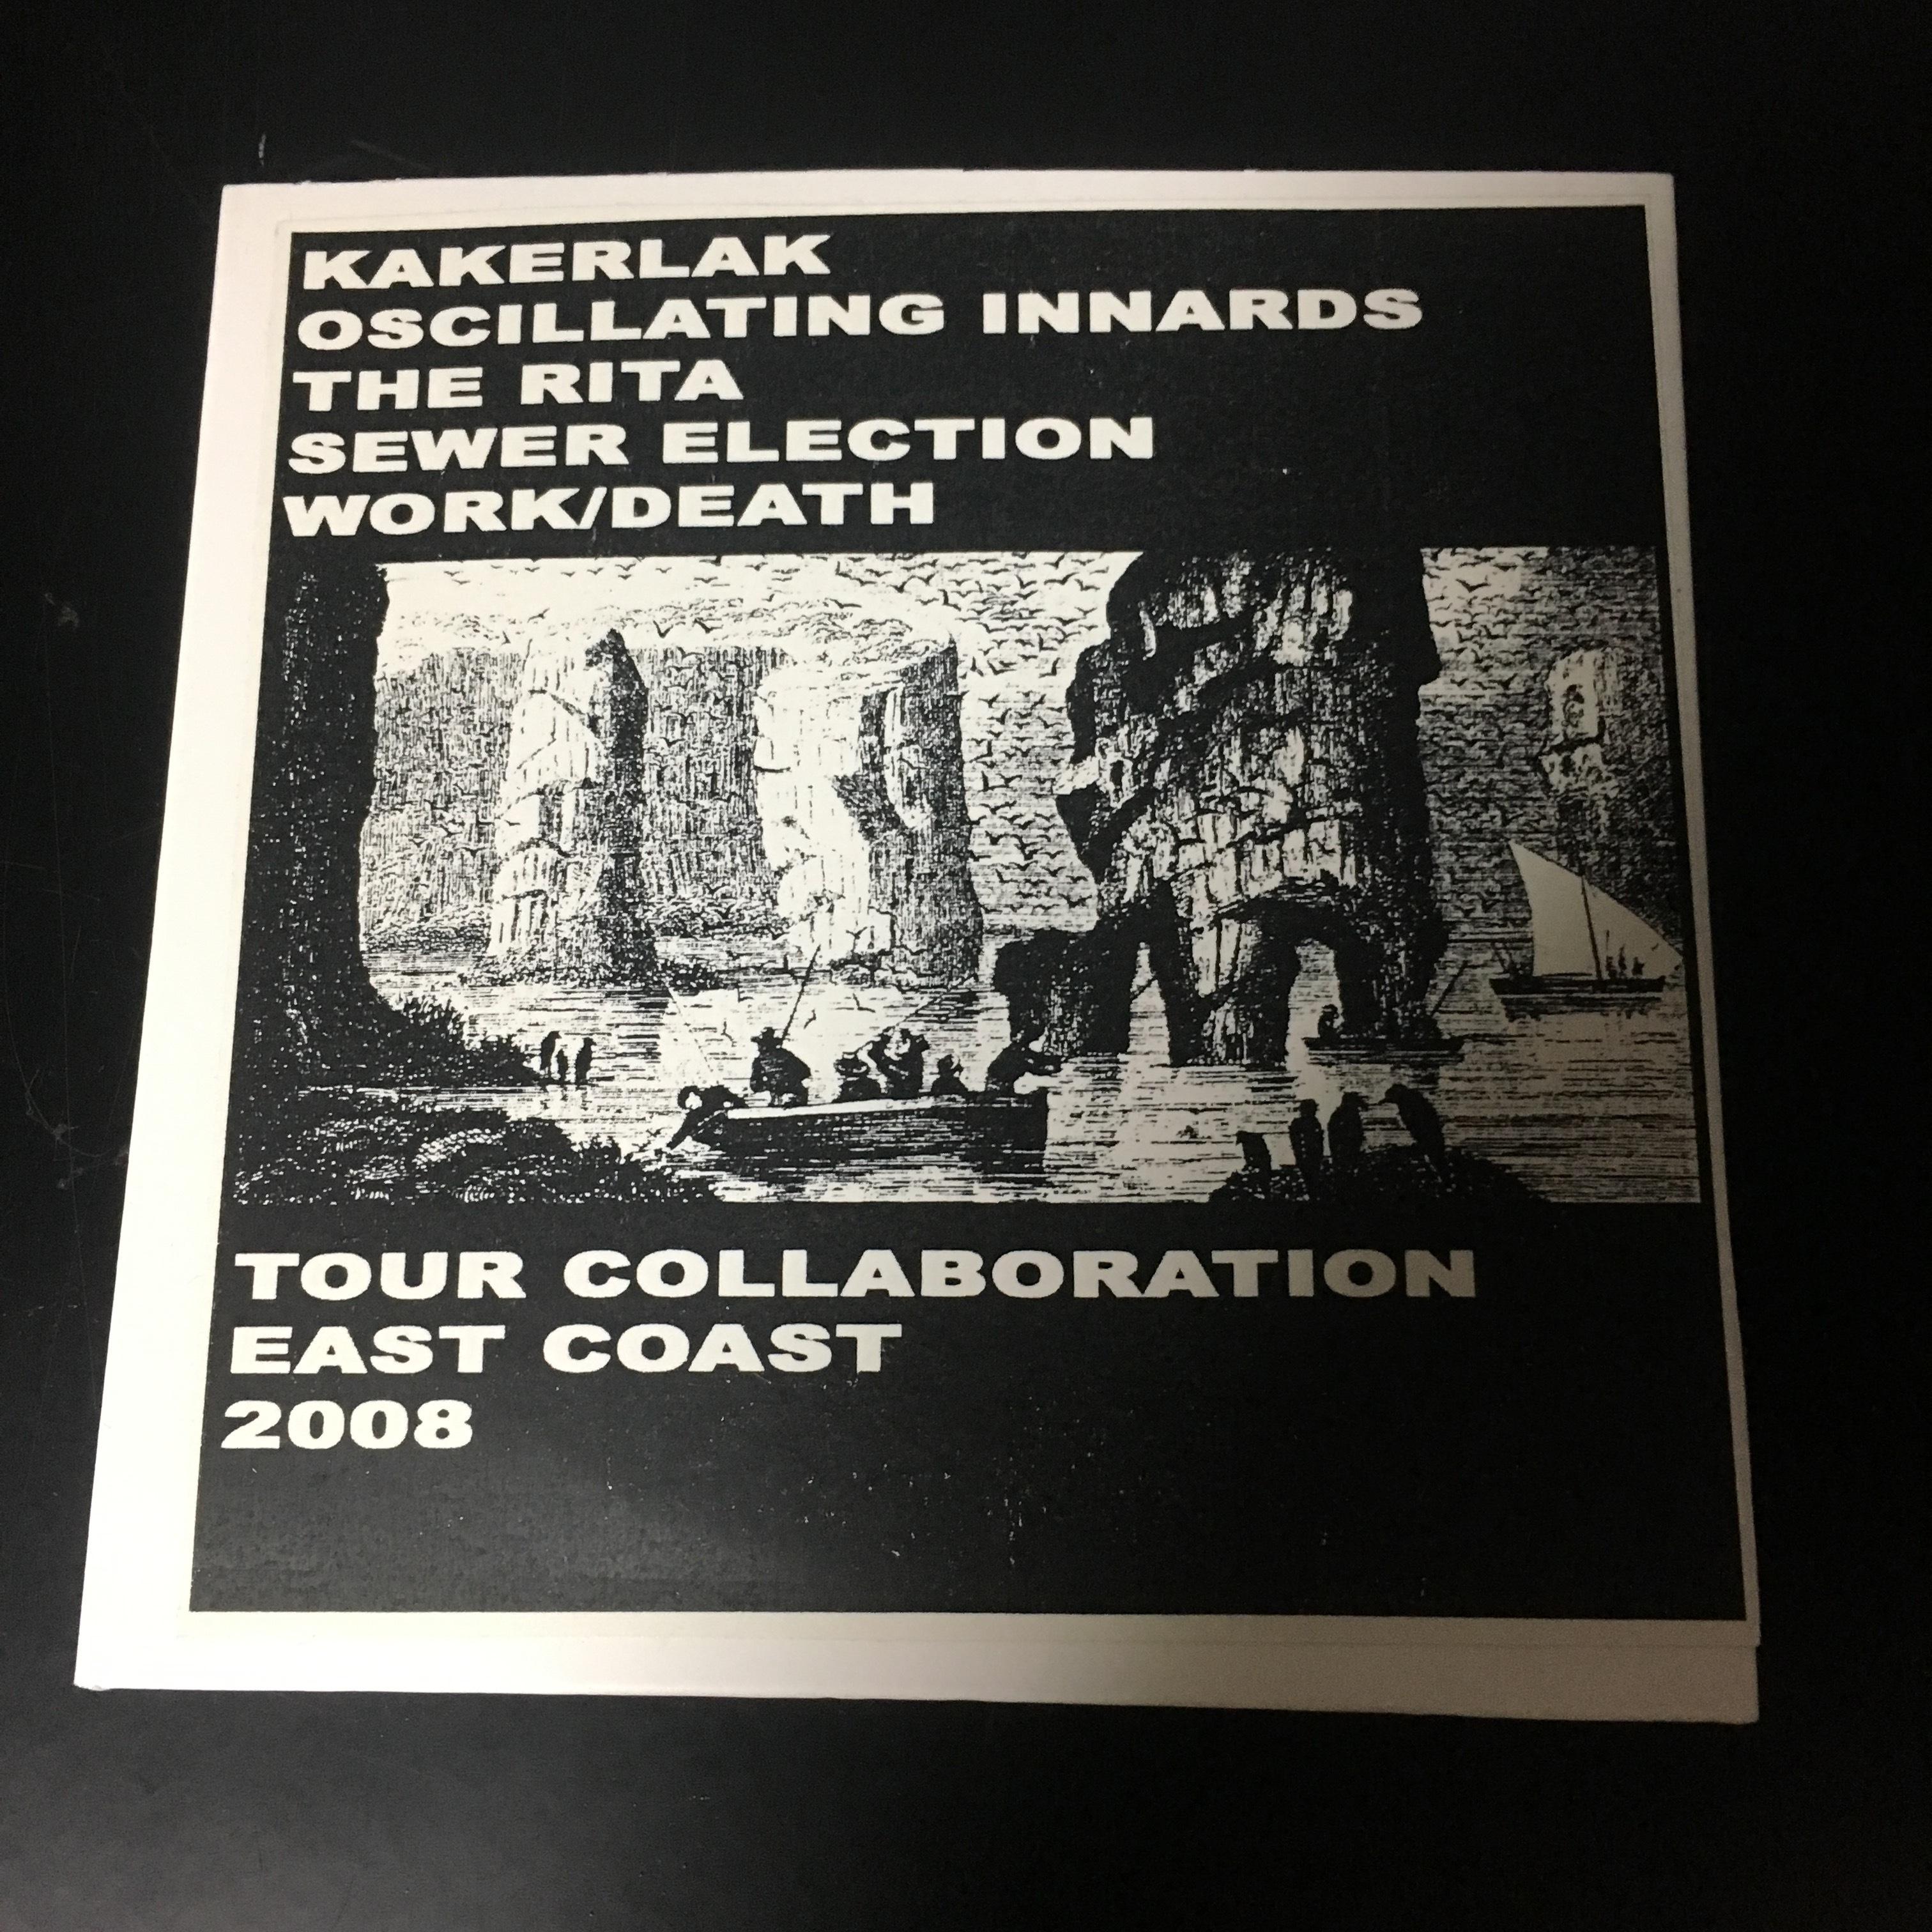 Kakerlak / Oscillating Innards / The Rita / Sewer Election / Work/Death – Tour Collaboration East Coast(CDR)USED